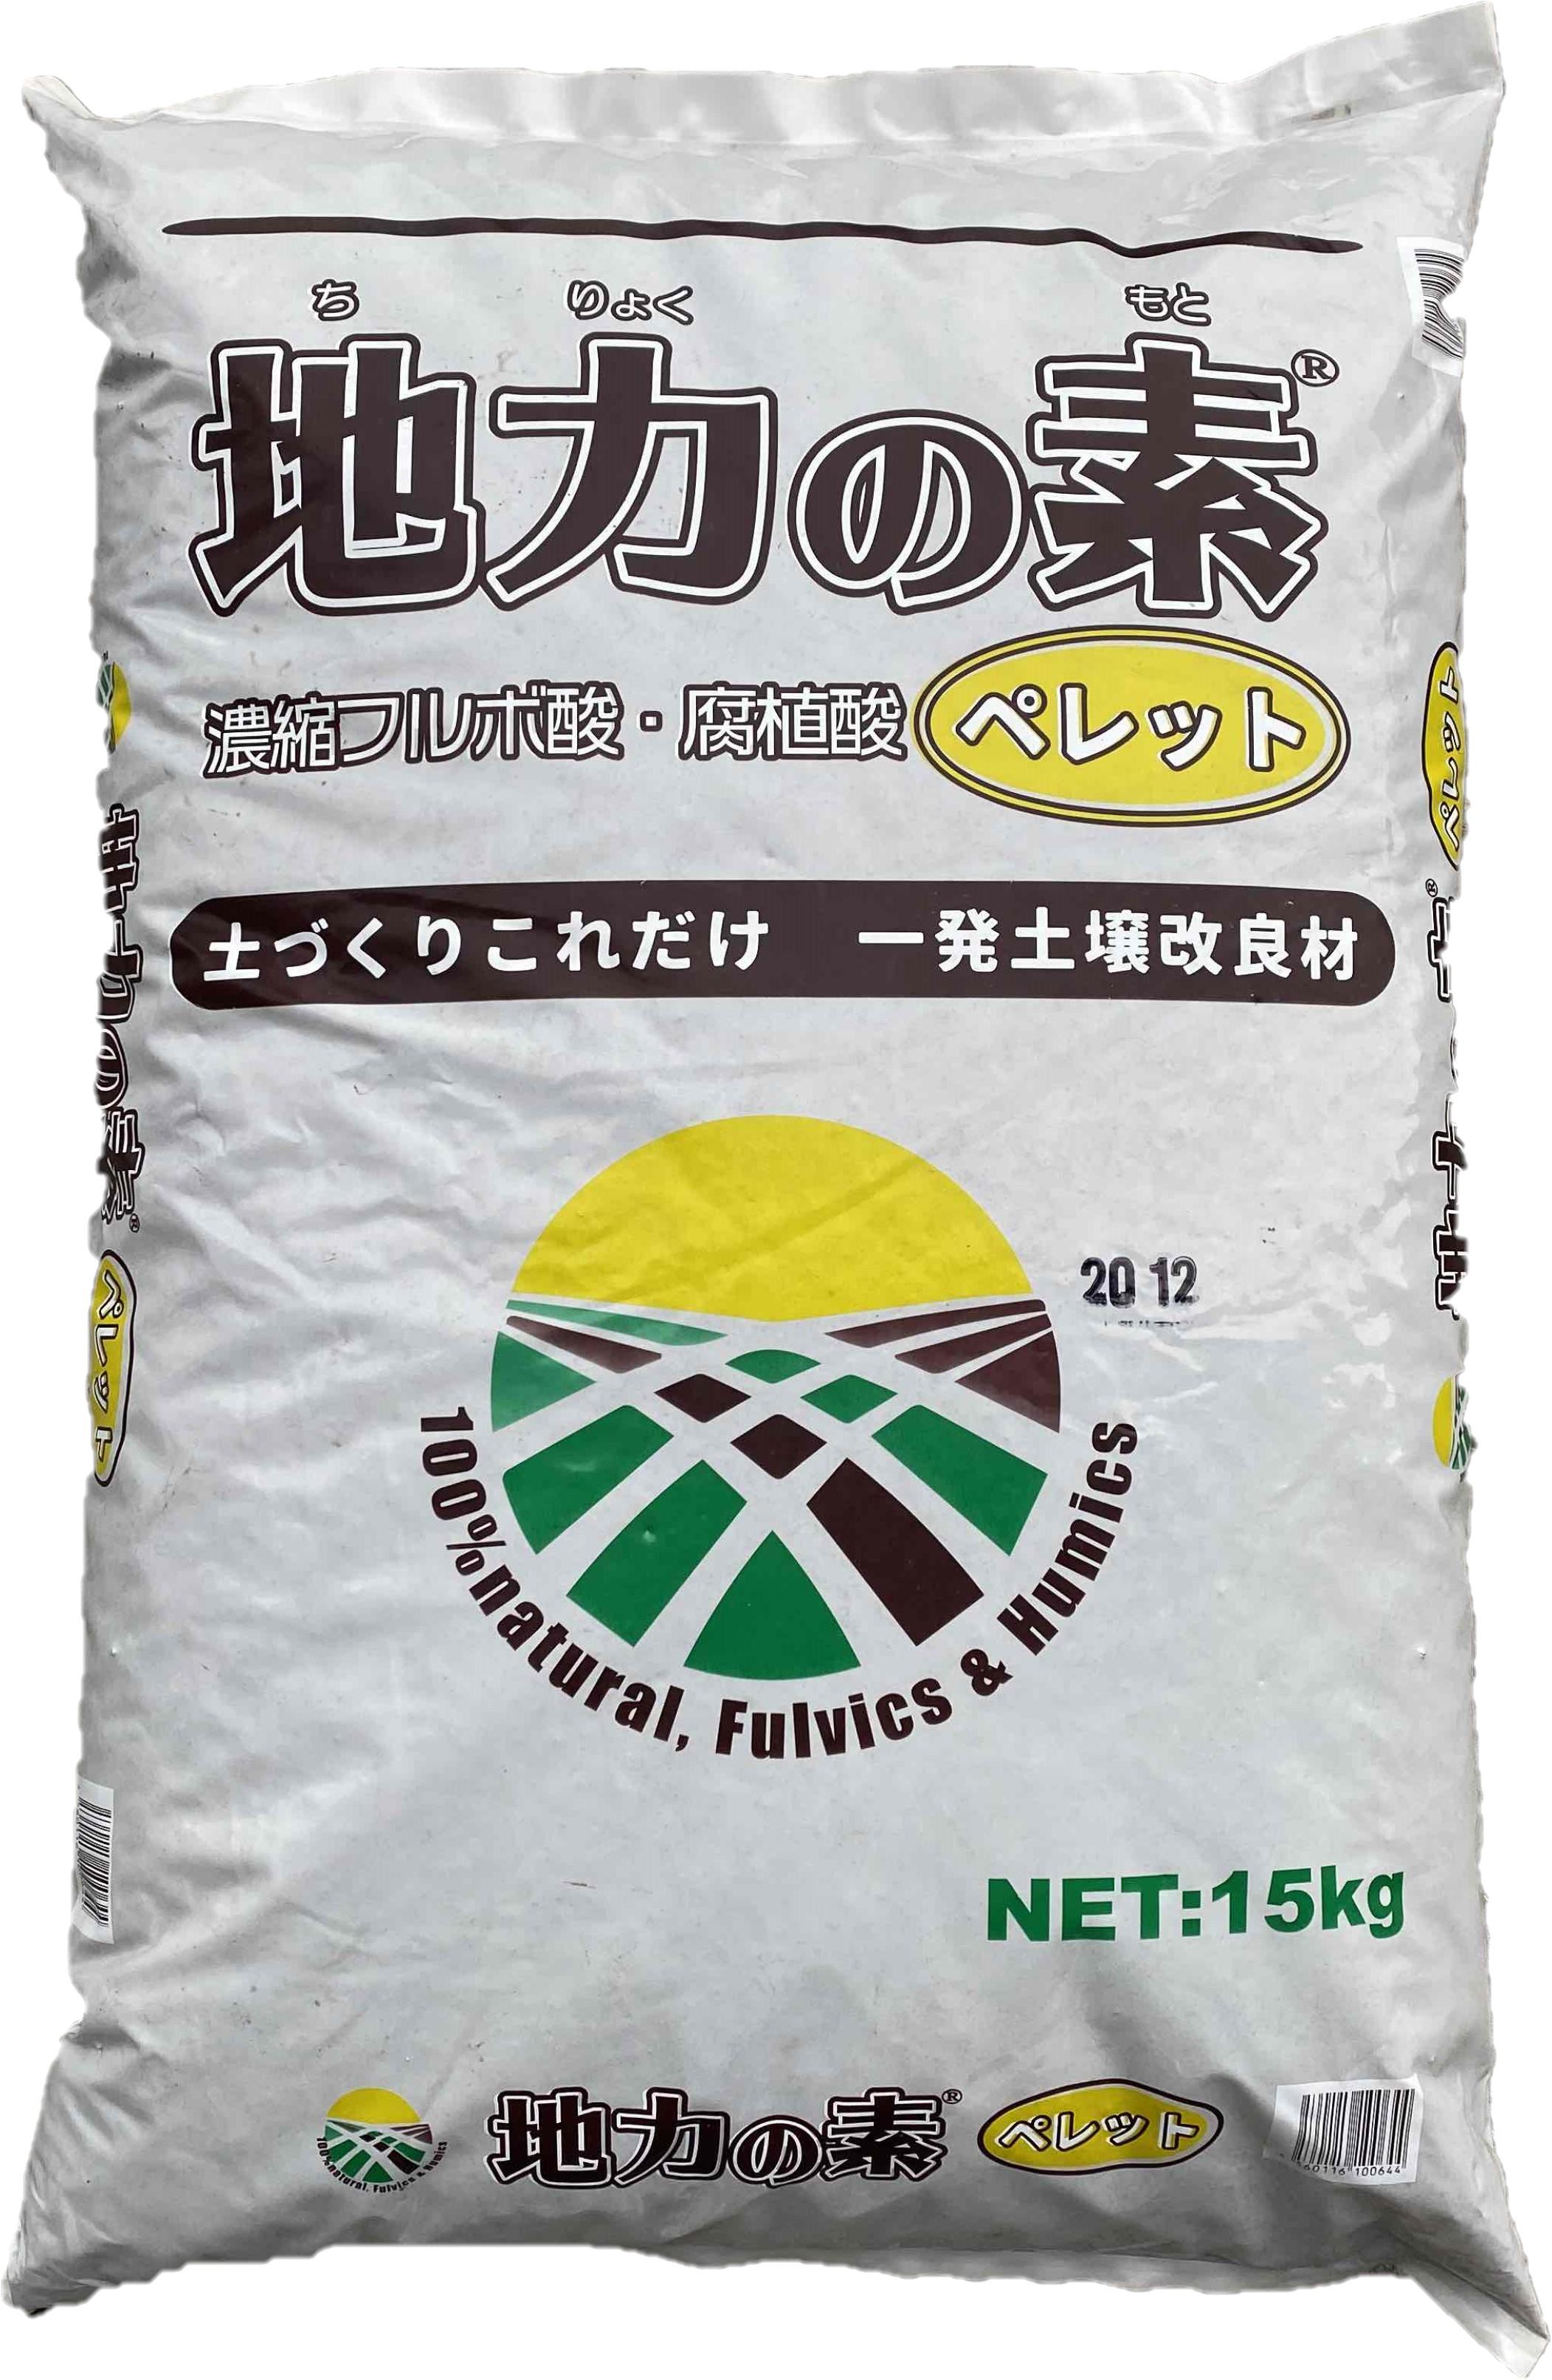 地力の素《土壌改良剤》